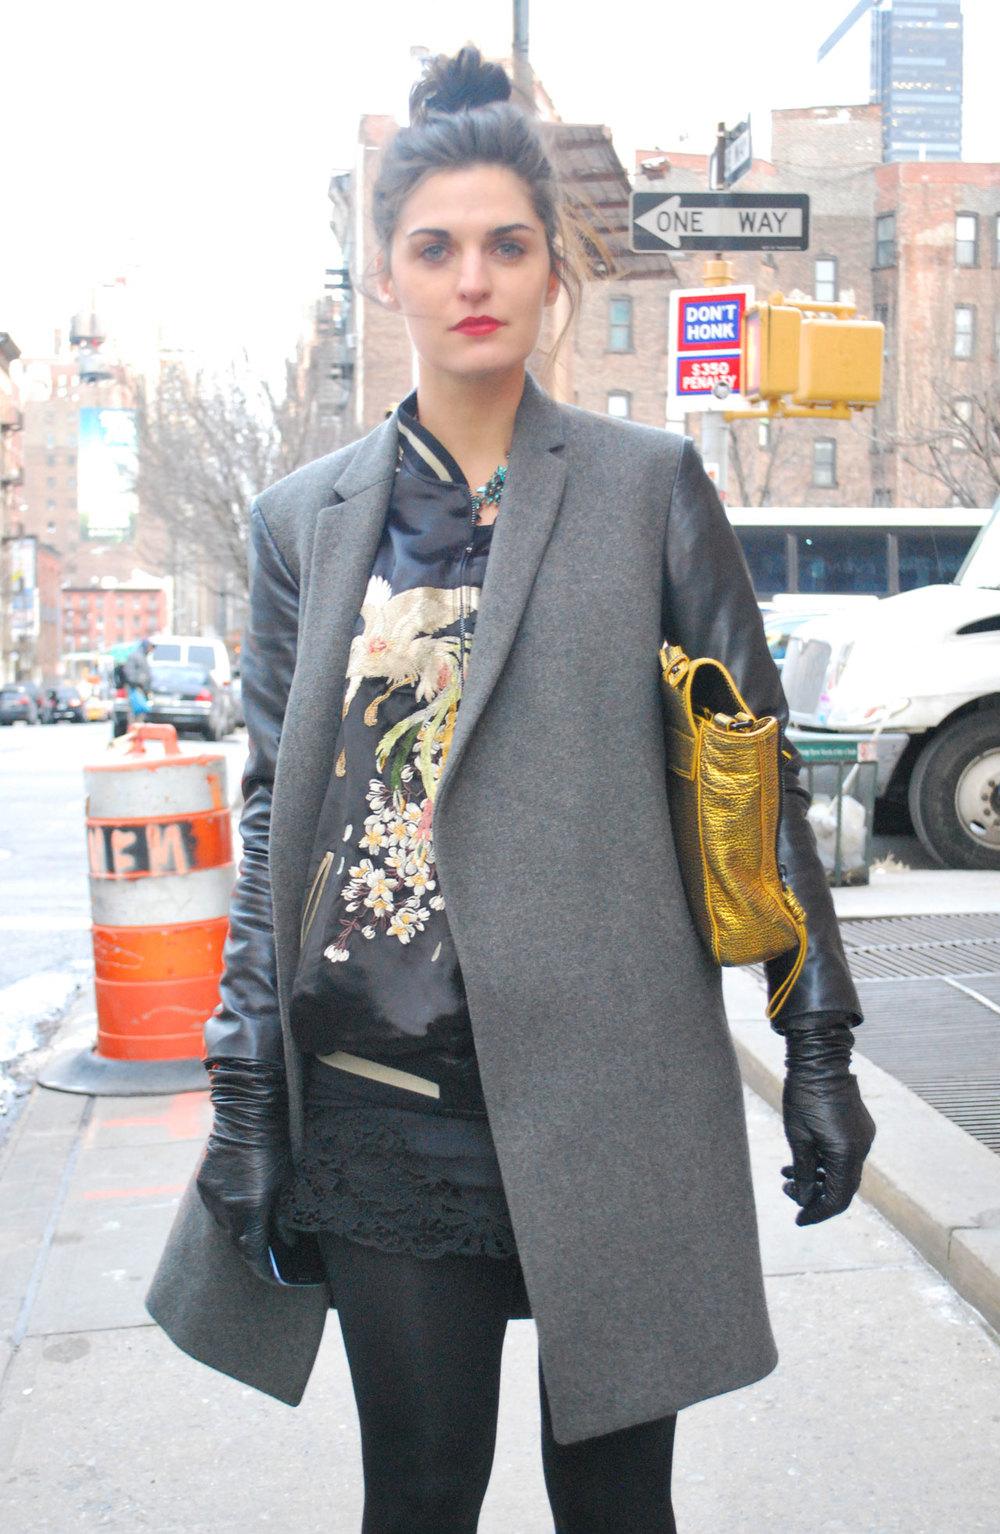 New-York-Fashion-Week-Women-Portrait-Street-style-FW-13-20130211_0316.jpg